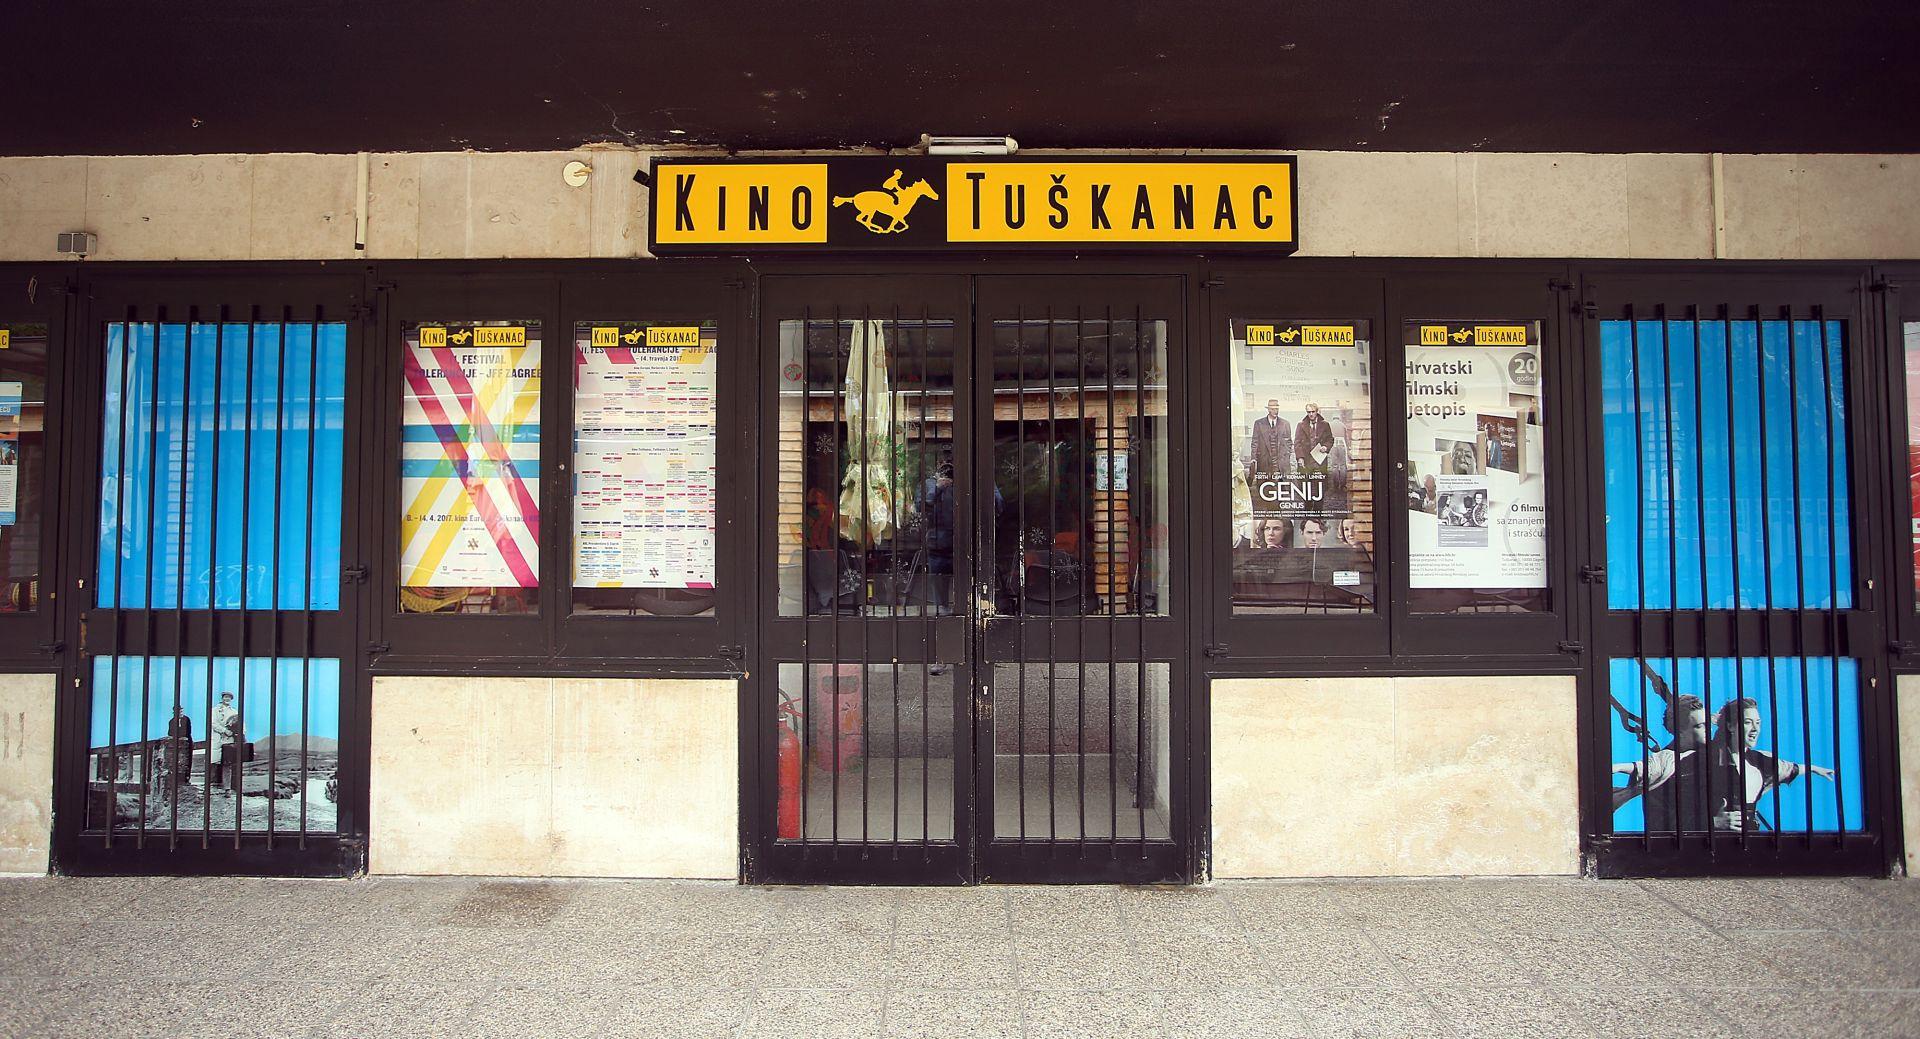 Politička platforma Zagreb je naš podržala akciju Daj mi kino – 2.